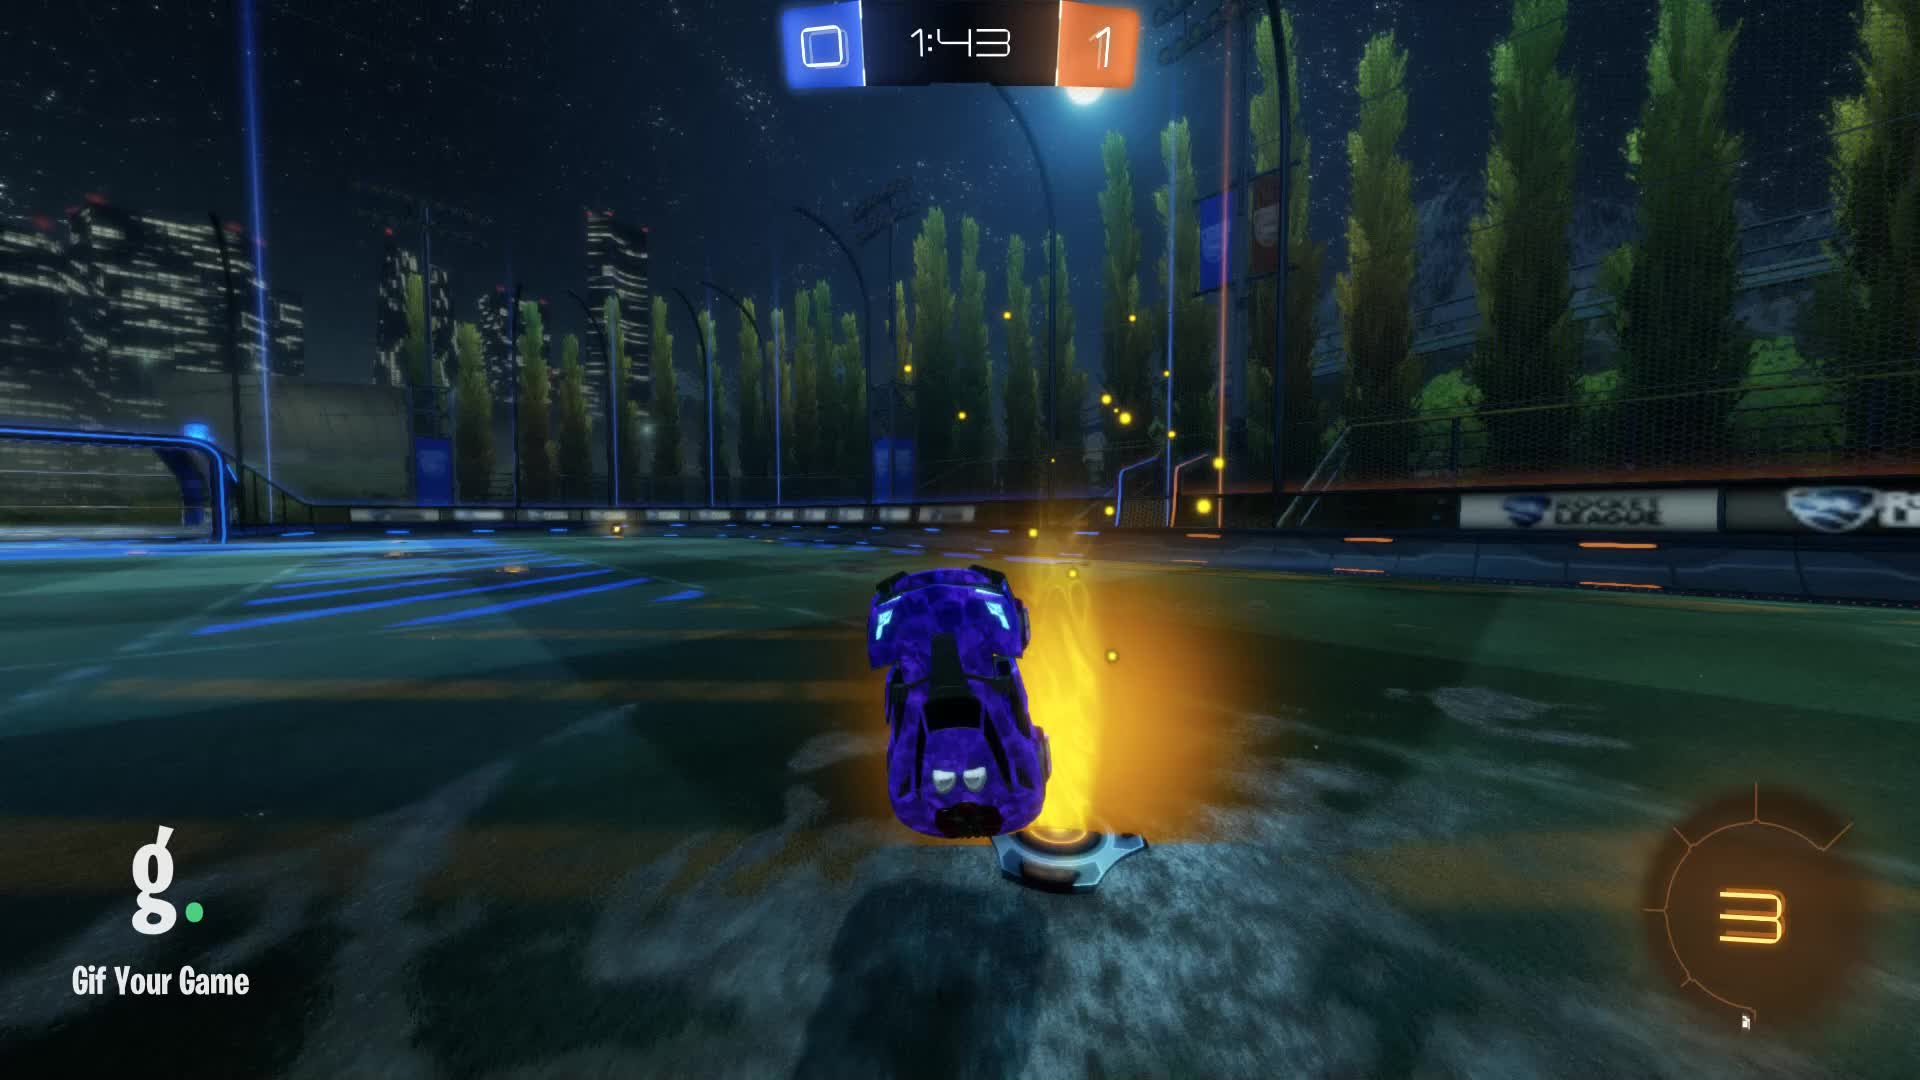 Barrackoli, Gif Your Game, GifYourGame, Goal, Rocket League, RocketLeague, Goal 2: Ice Poseidon GIFs